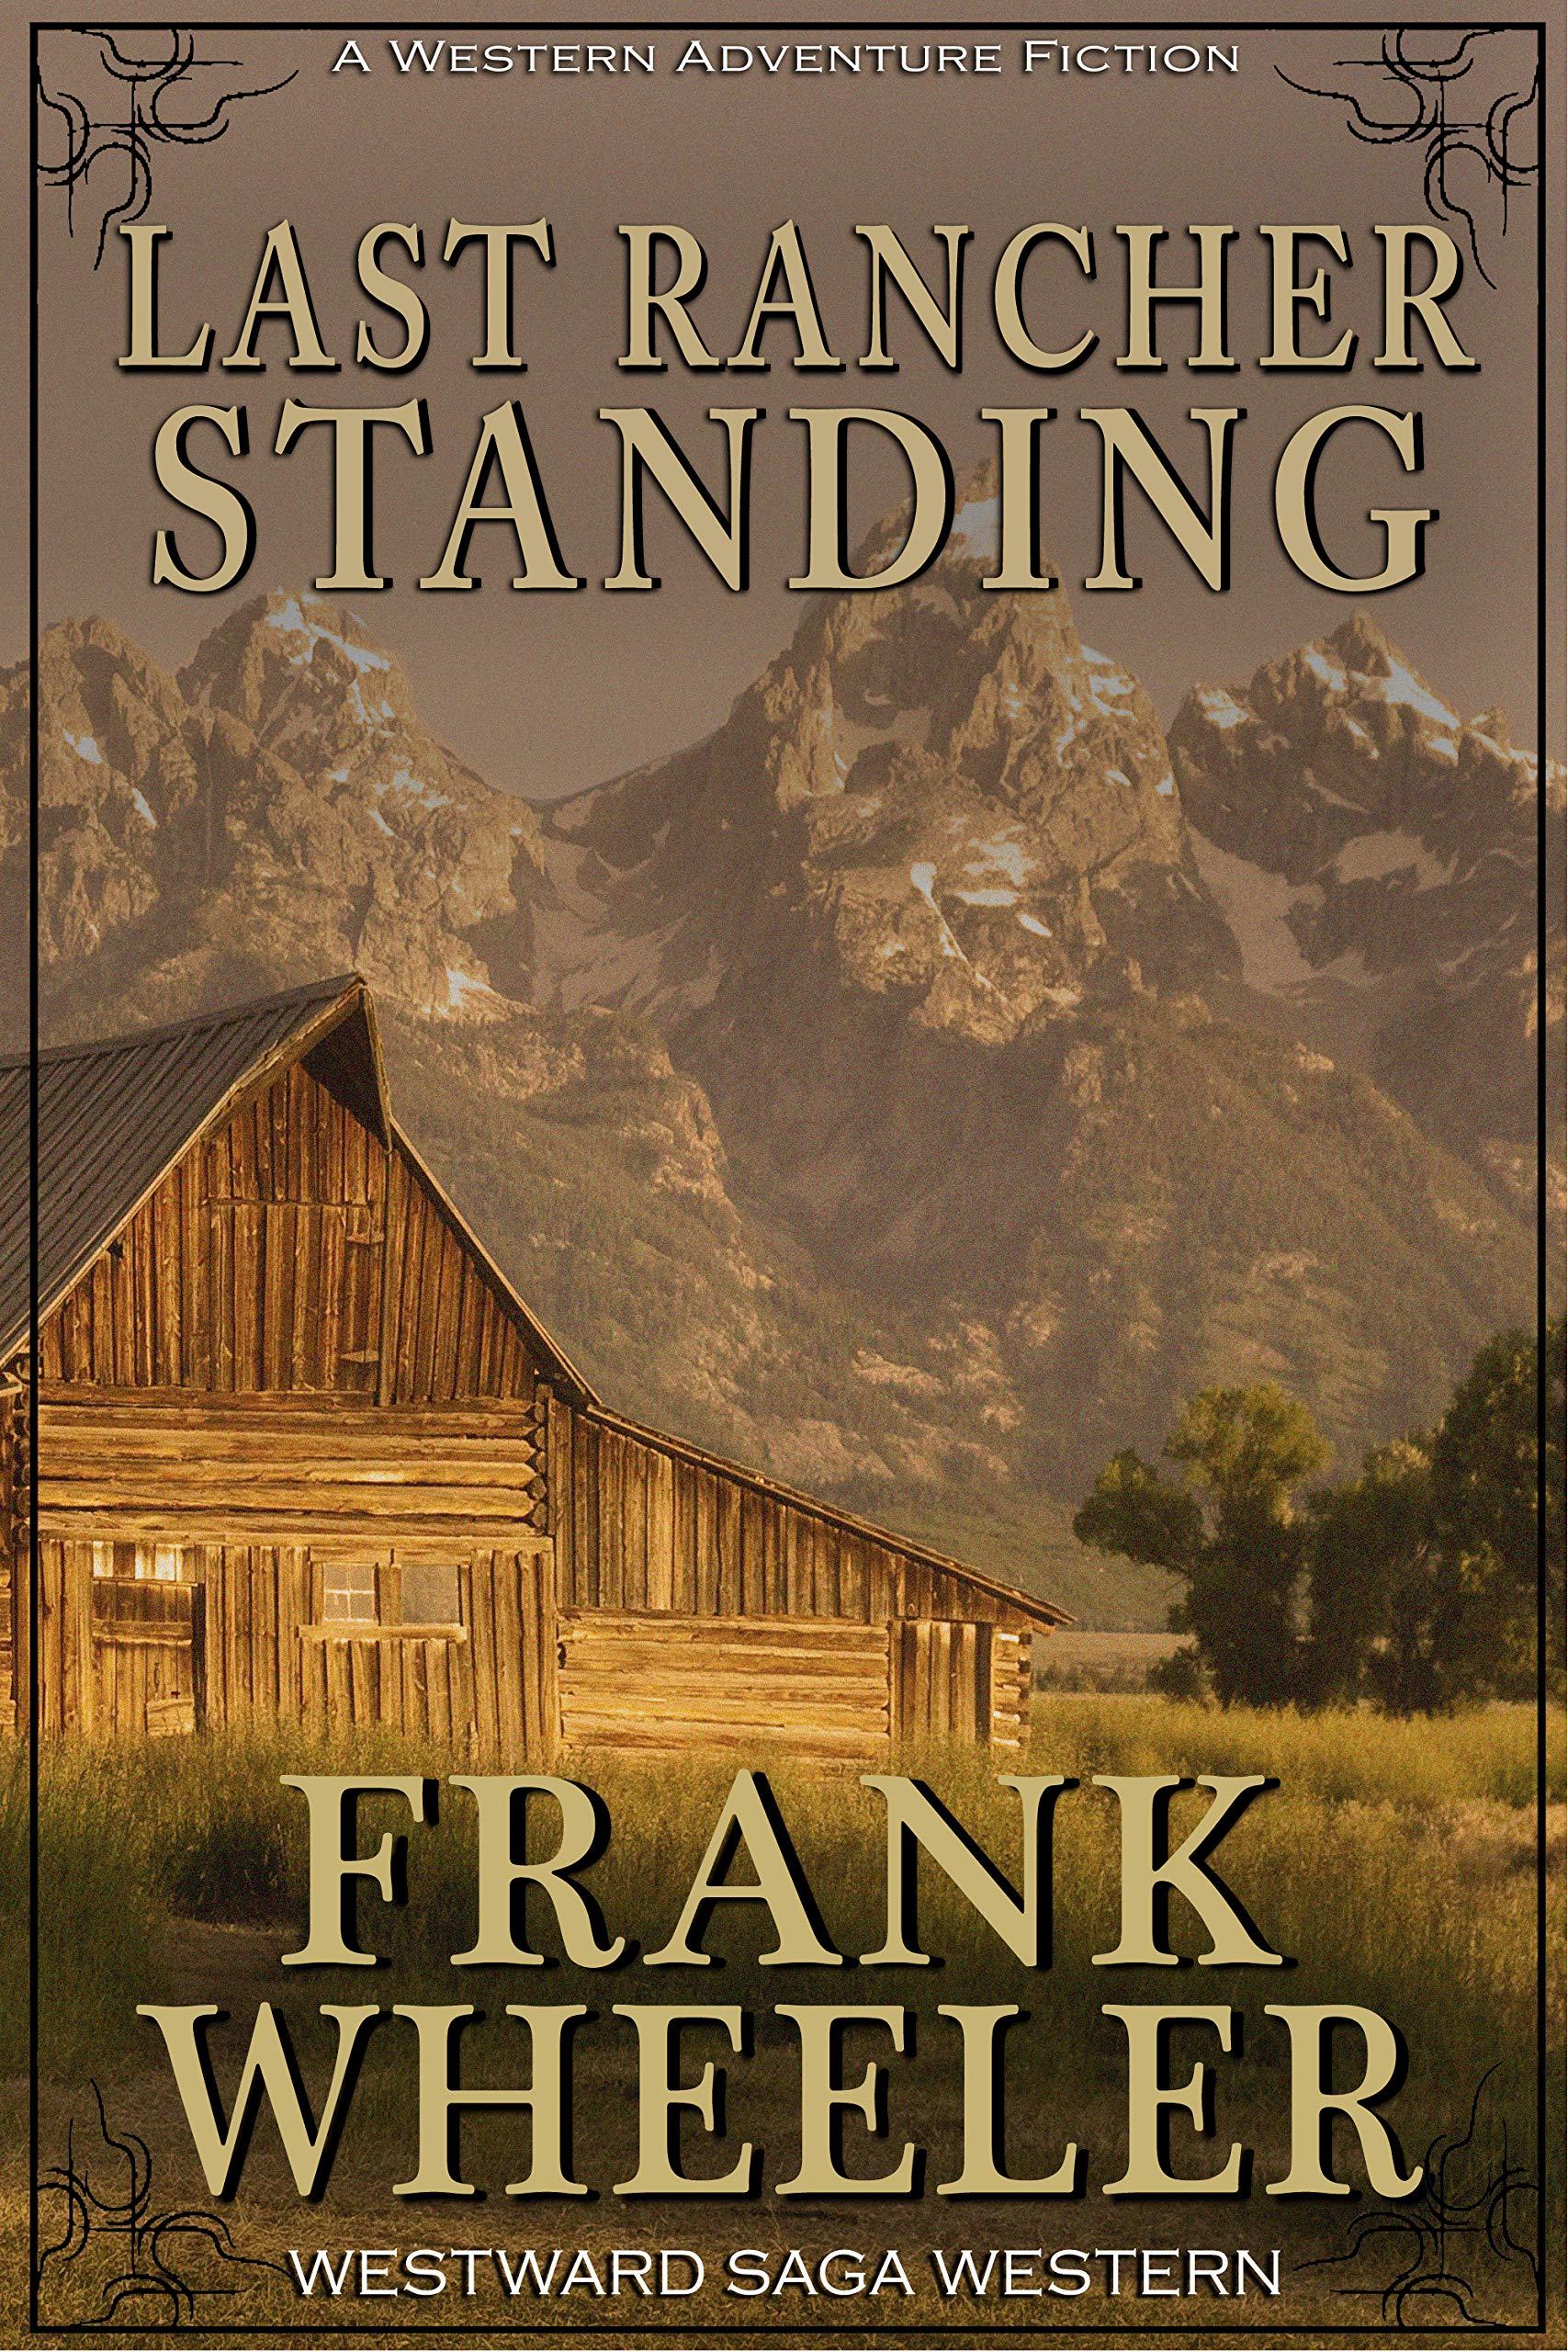 Last Rancher Standing (Westward Saga Western) (A Western Adventure Fiction)